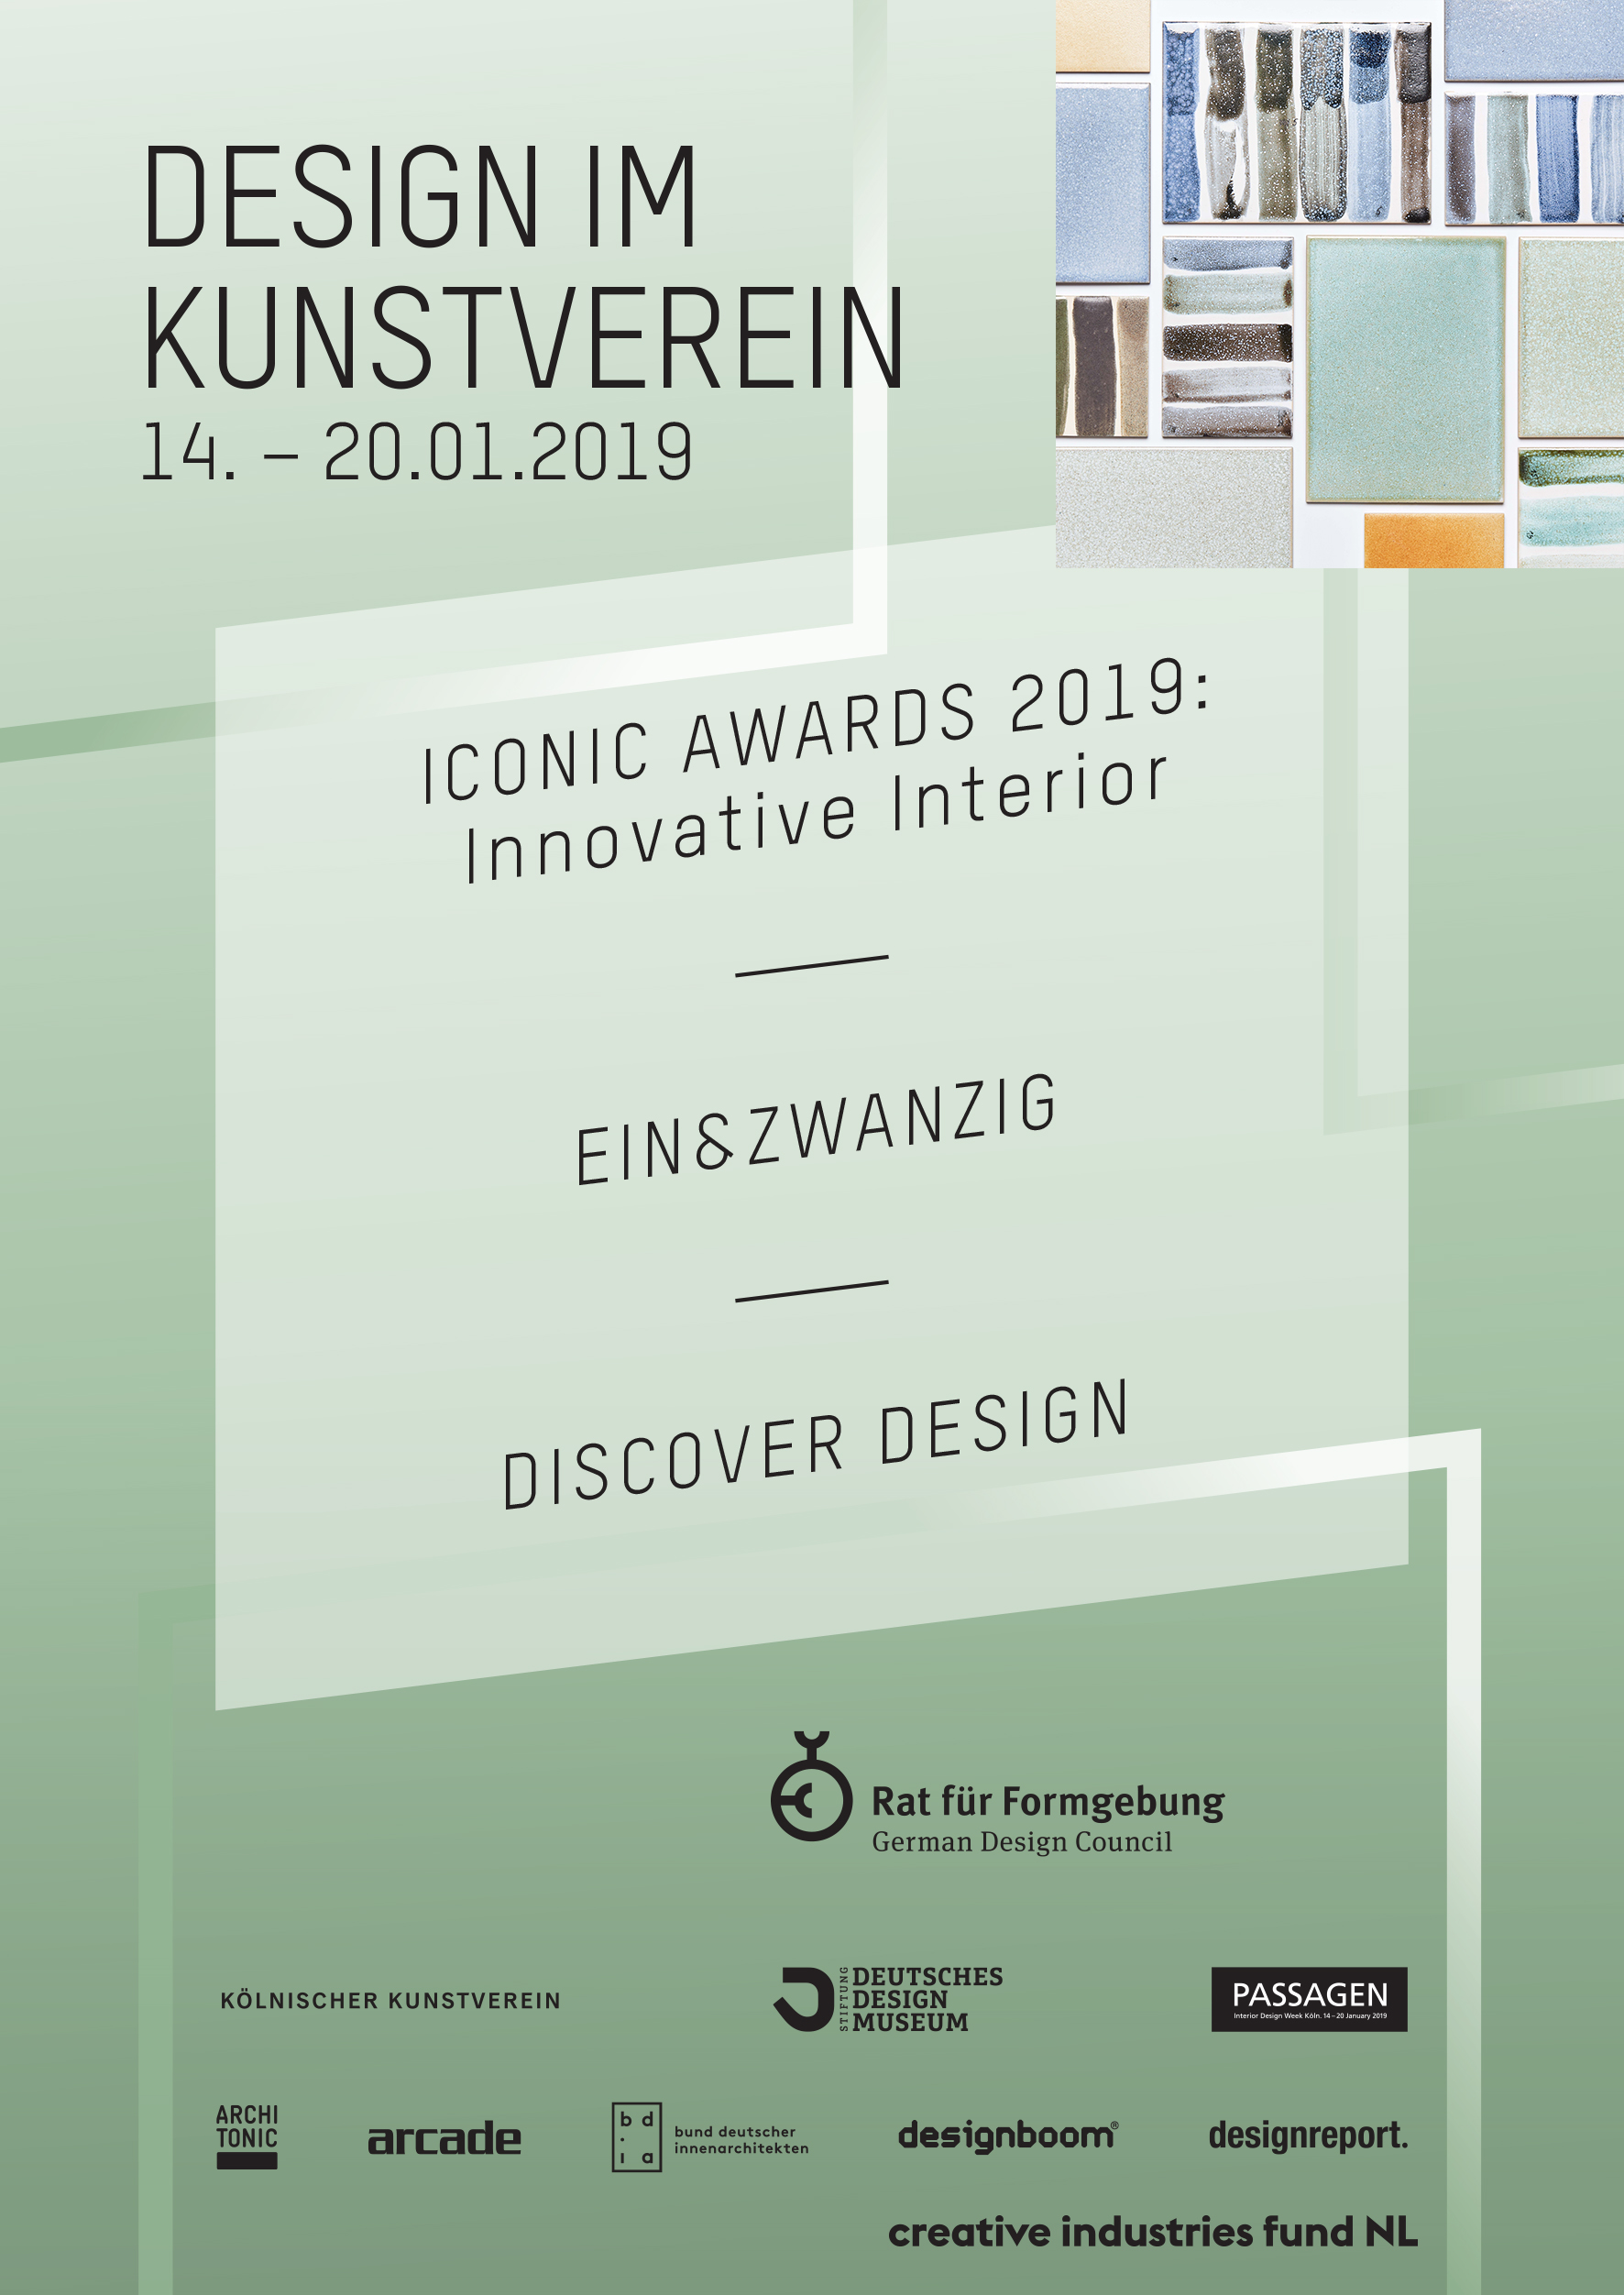 Design_im_Kunstverein-1.jpg